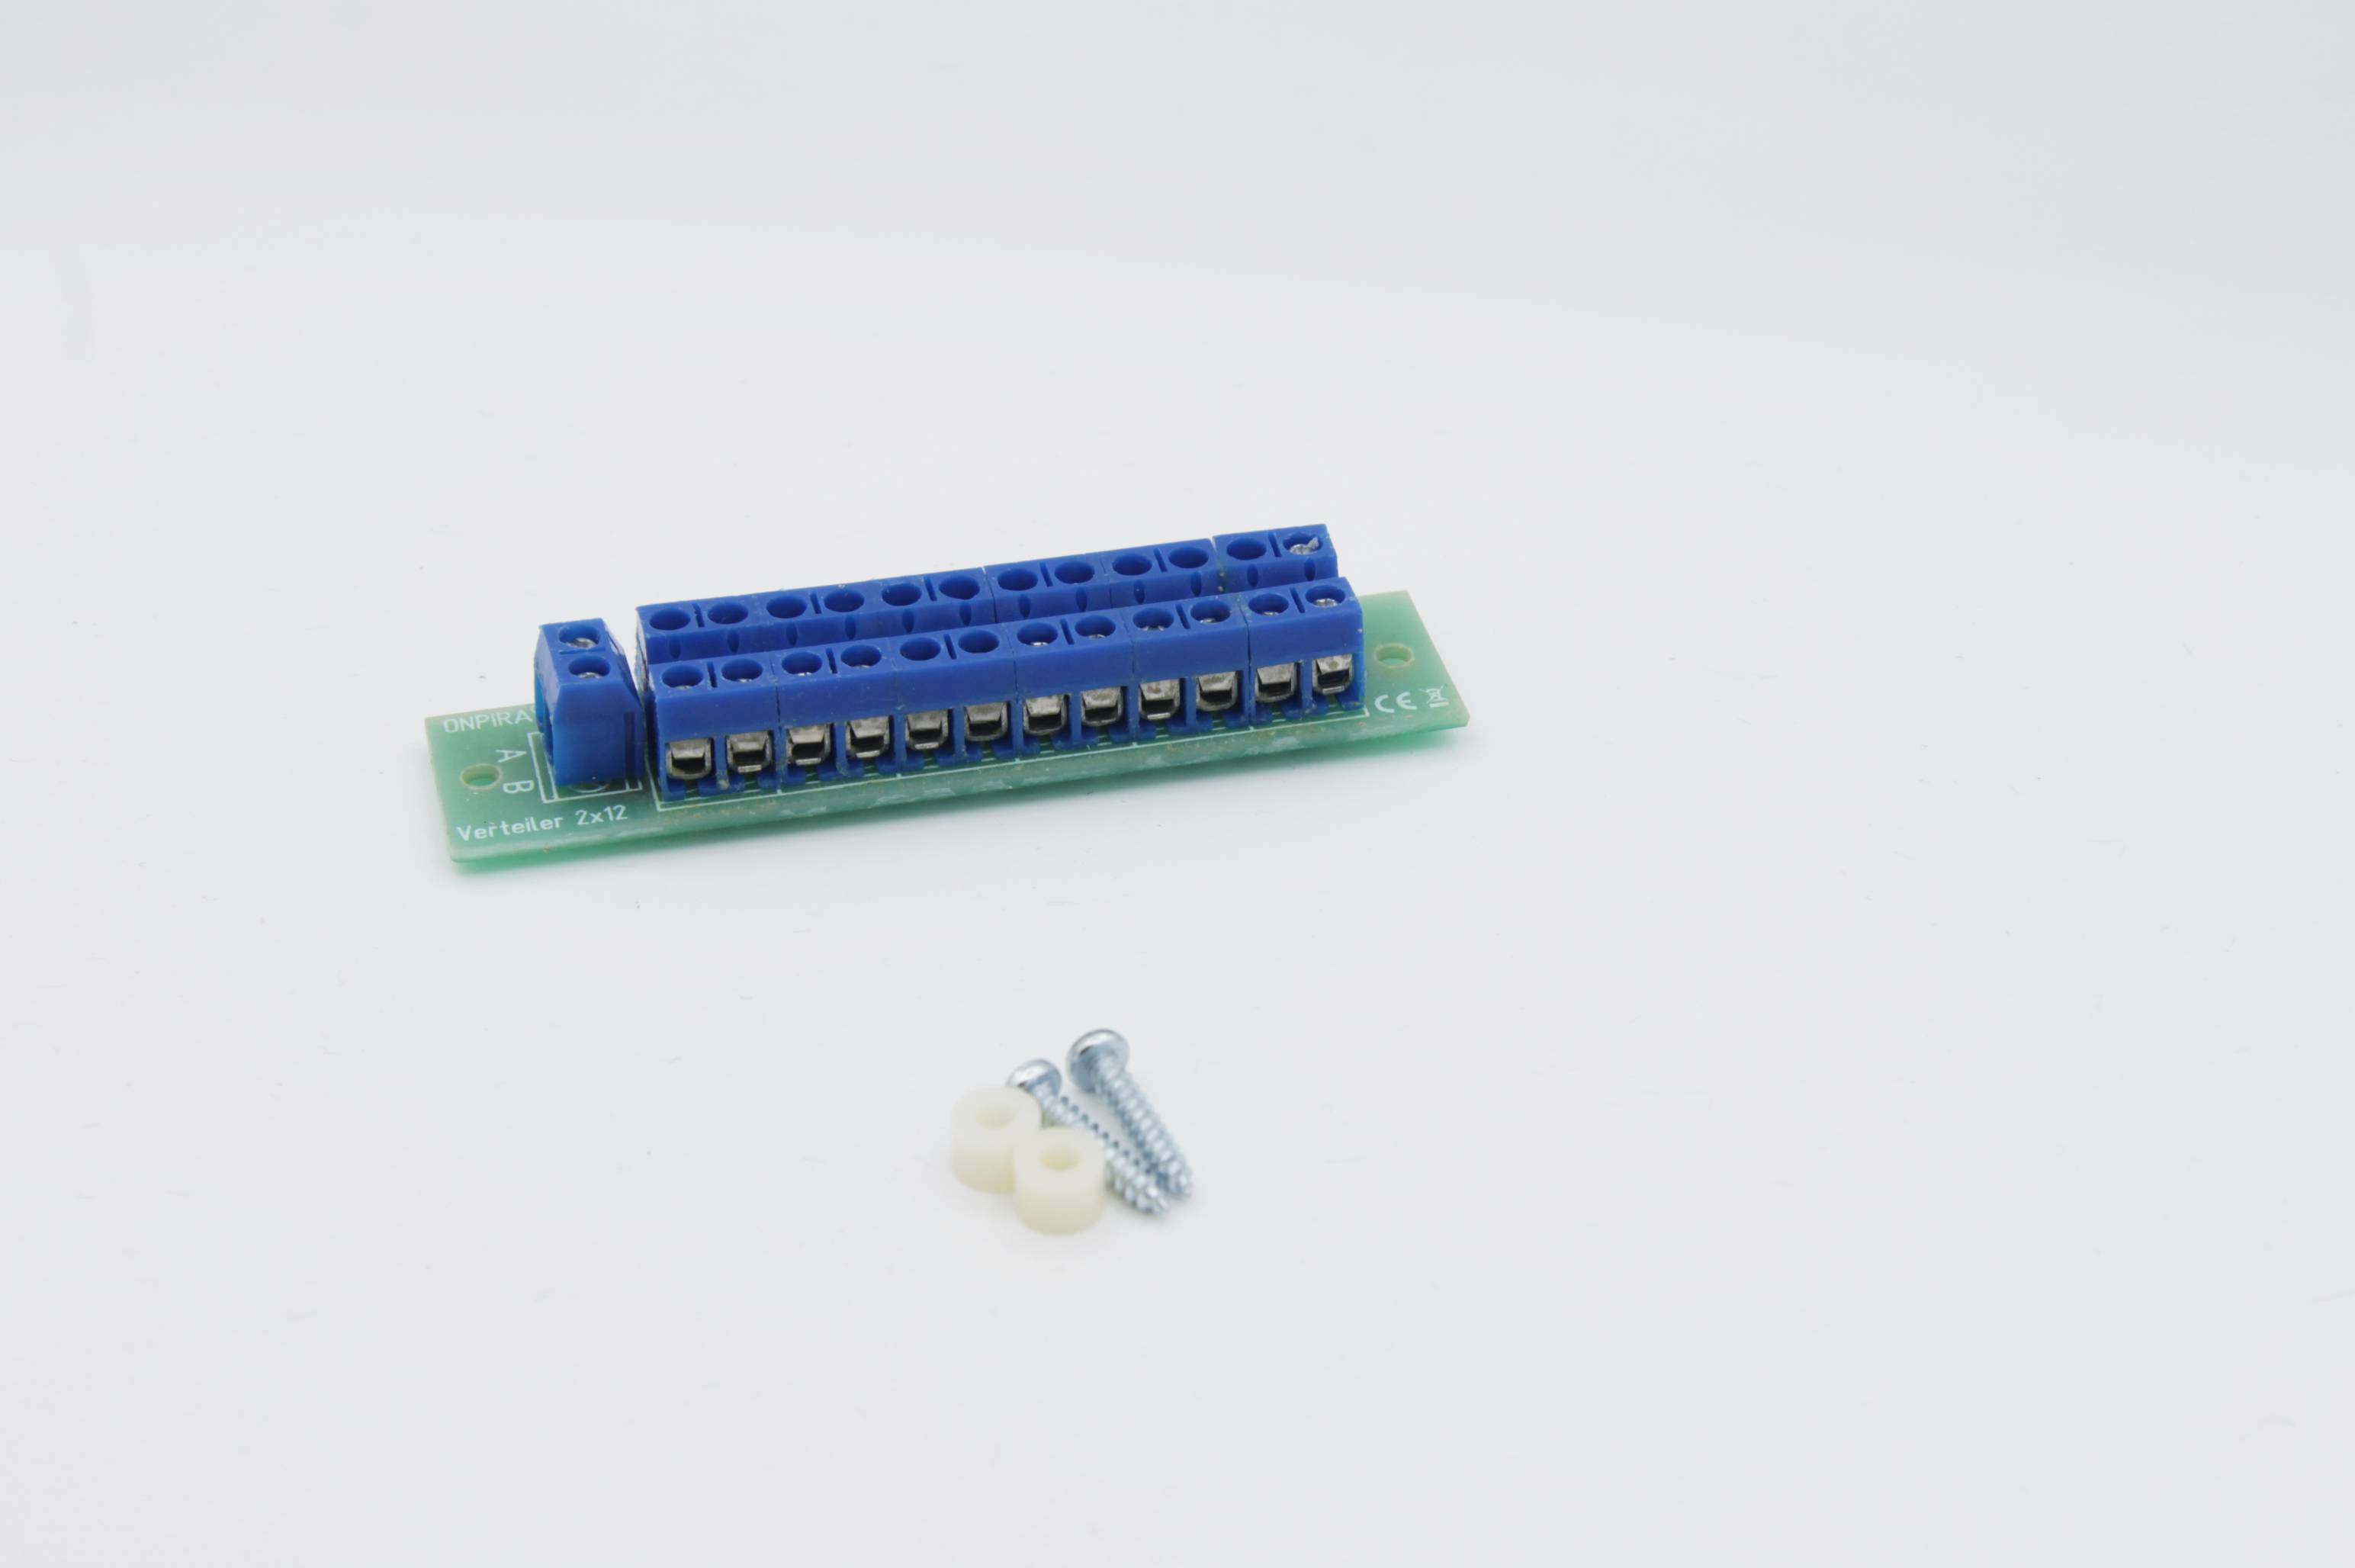 Stromverteiler Modellbahn 2x12 - 30V AC/DC Verteiler